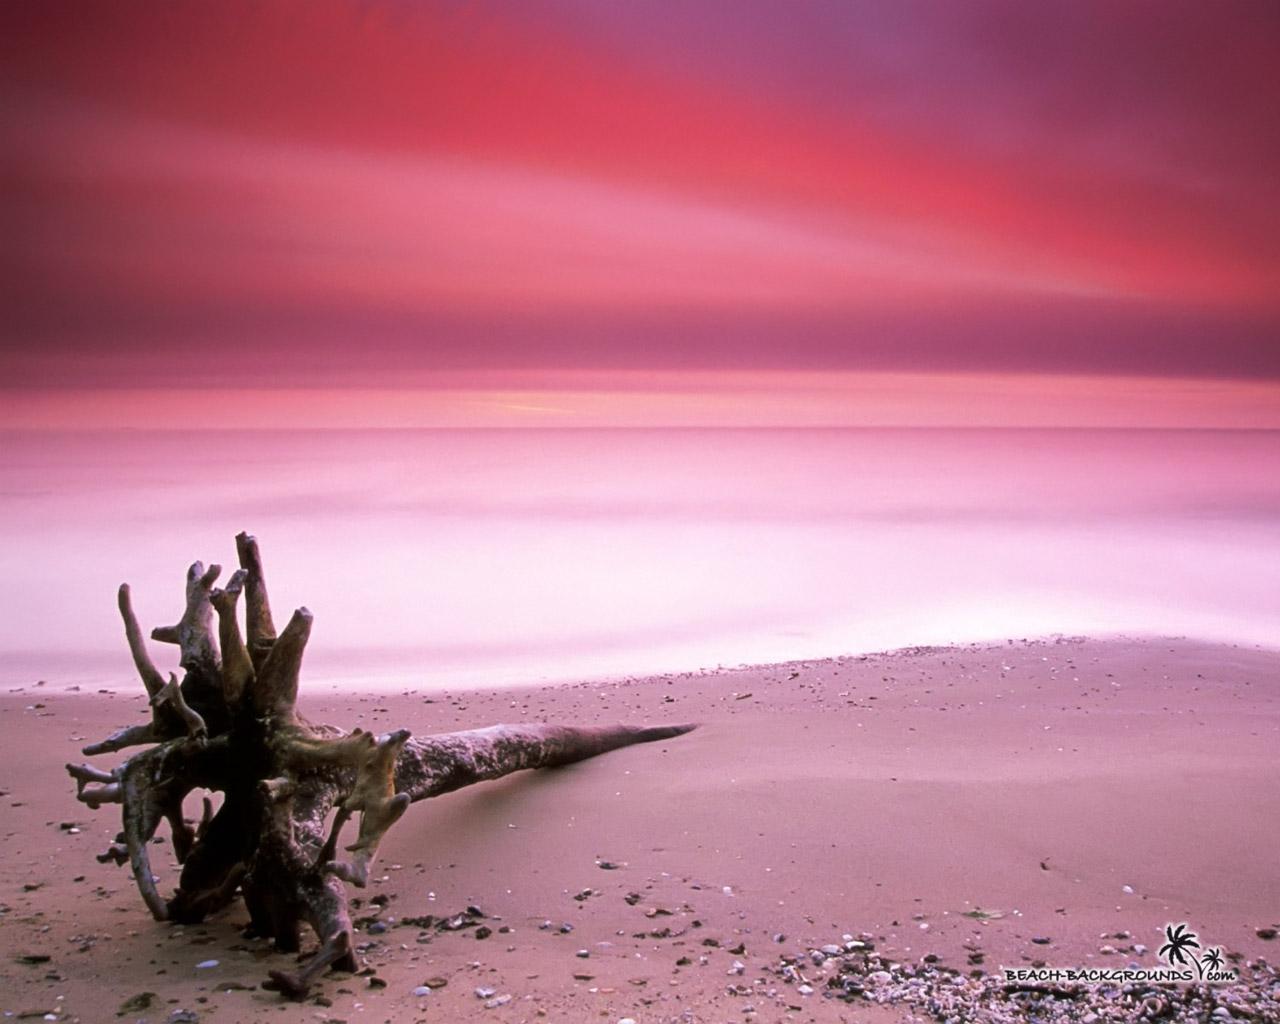 http://3.bp.blogspot.com/-aoN9kvugjZ0/TaNNqxnKX9I/AAAAAAAAAR8/kDa8ugzI_dY/s1600/maryland-beach-wallpaper-1280x1024.jpg